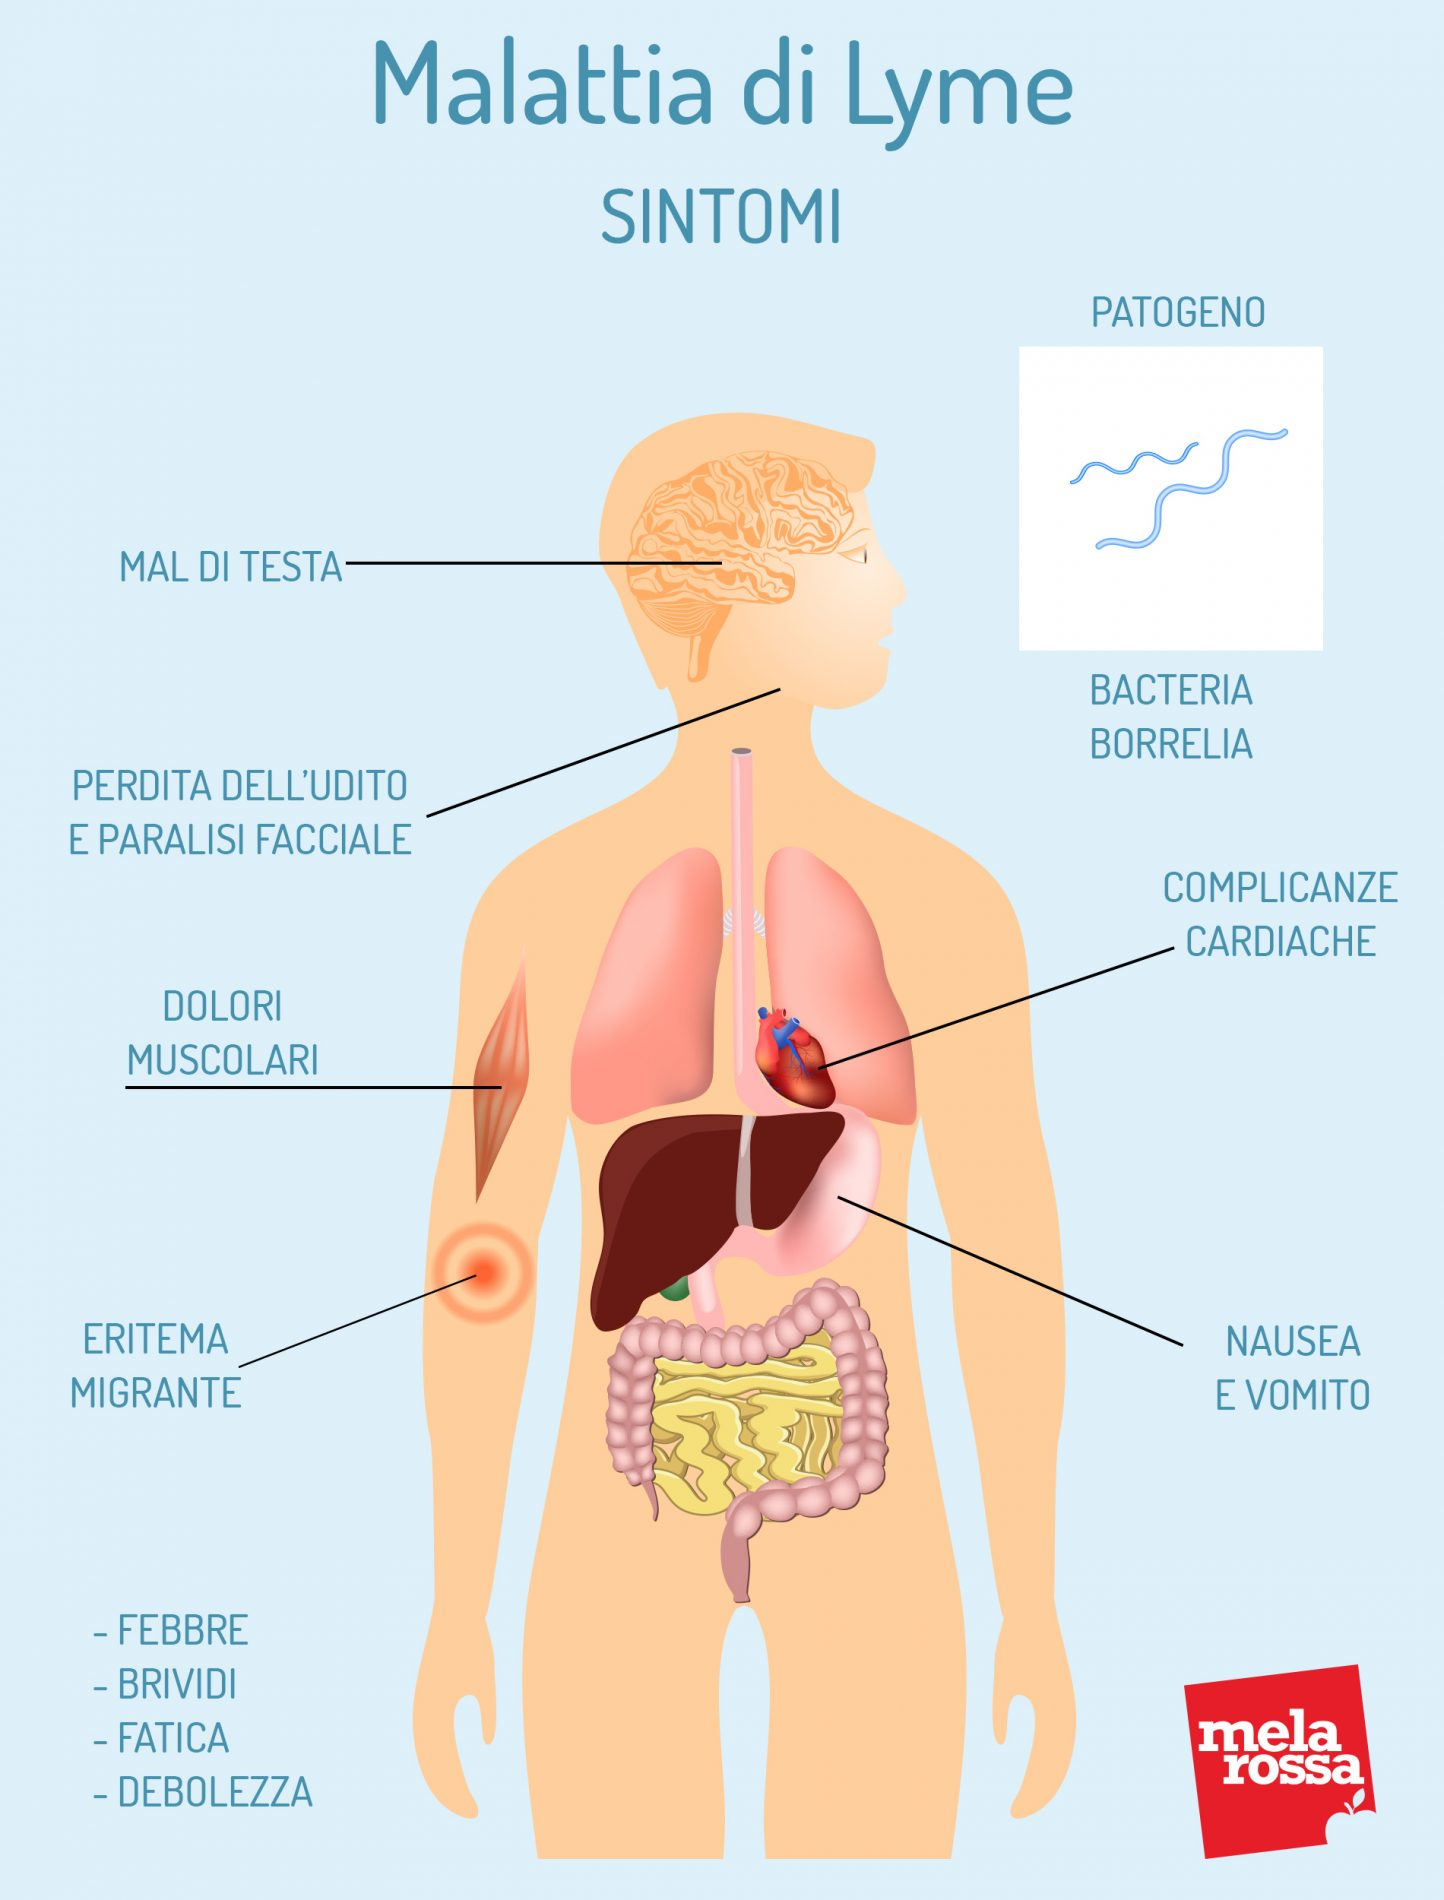 malattia di Lyme: sintomi